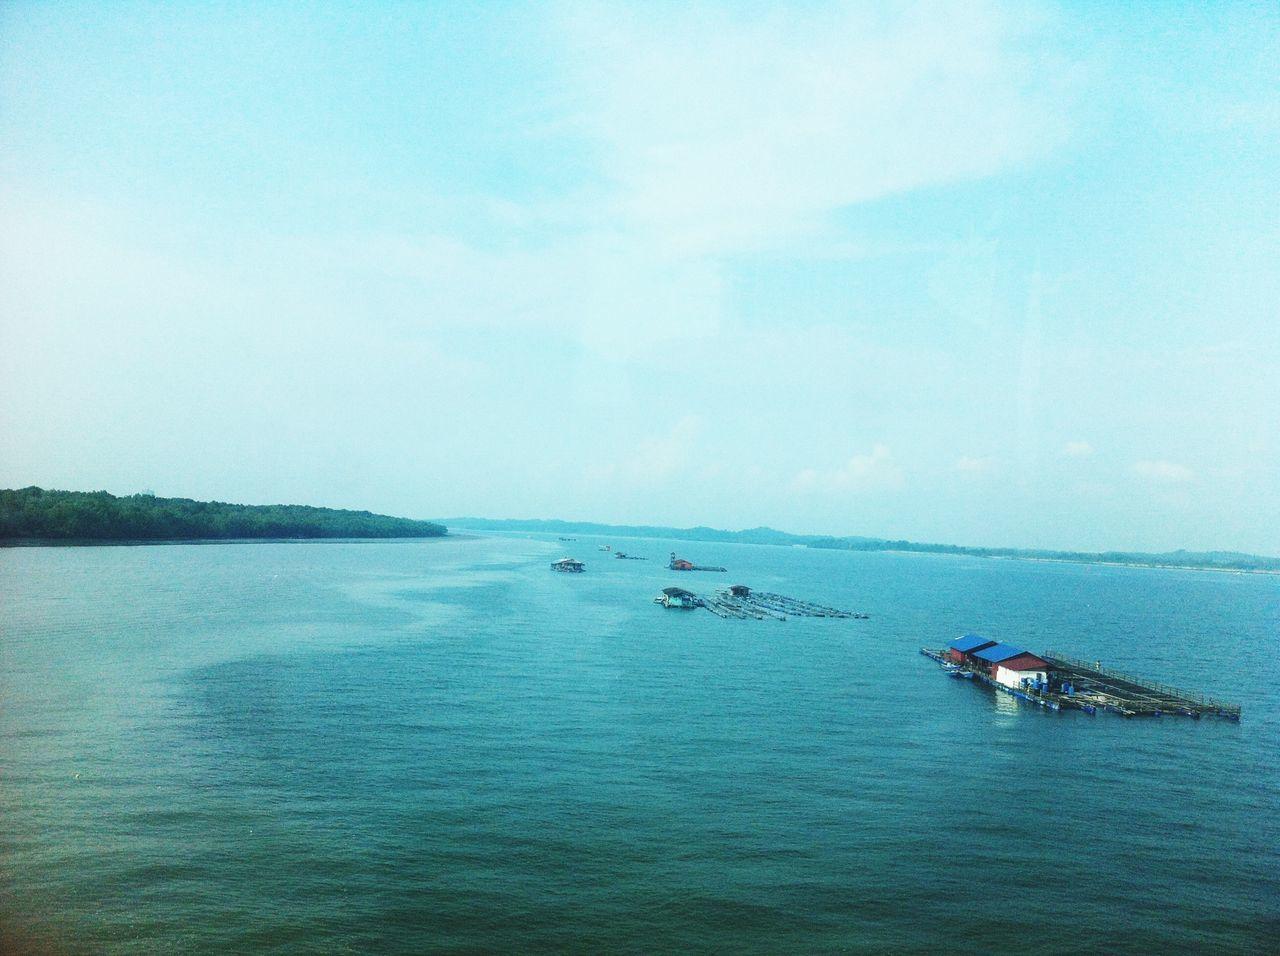 Fishing On The Bridge In Between Malaysia And Singapore